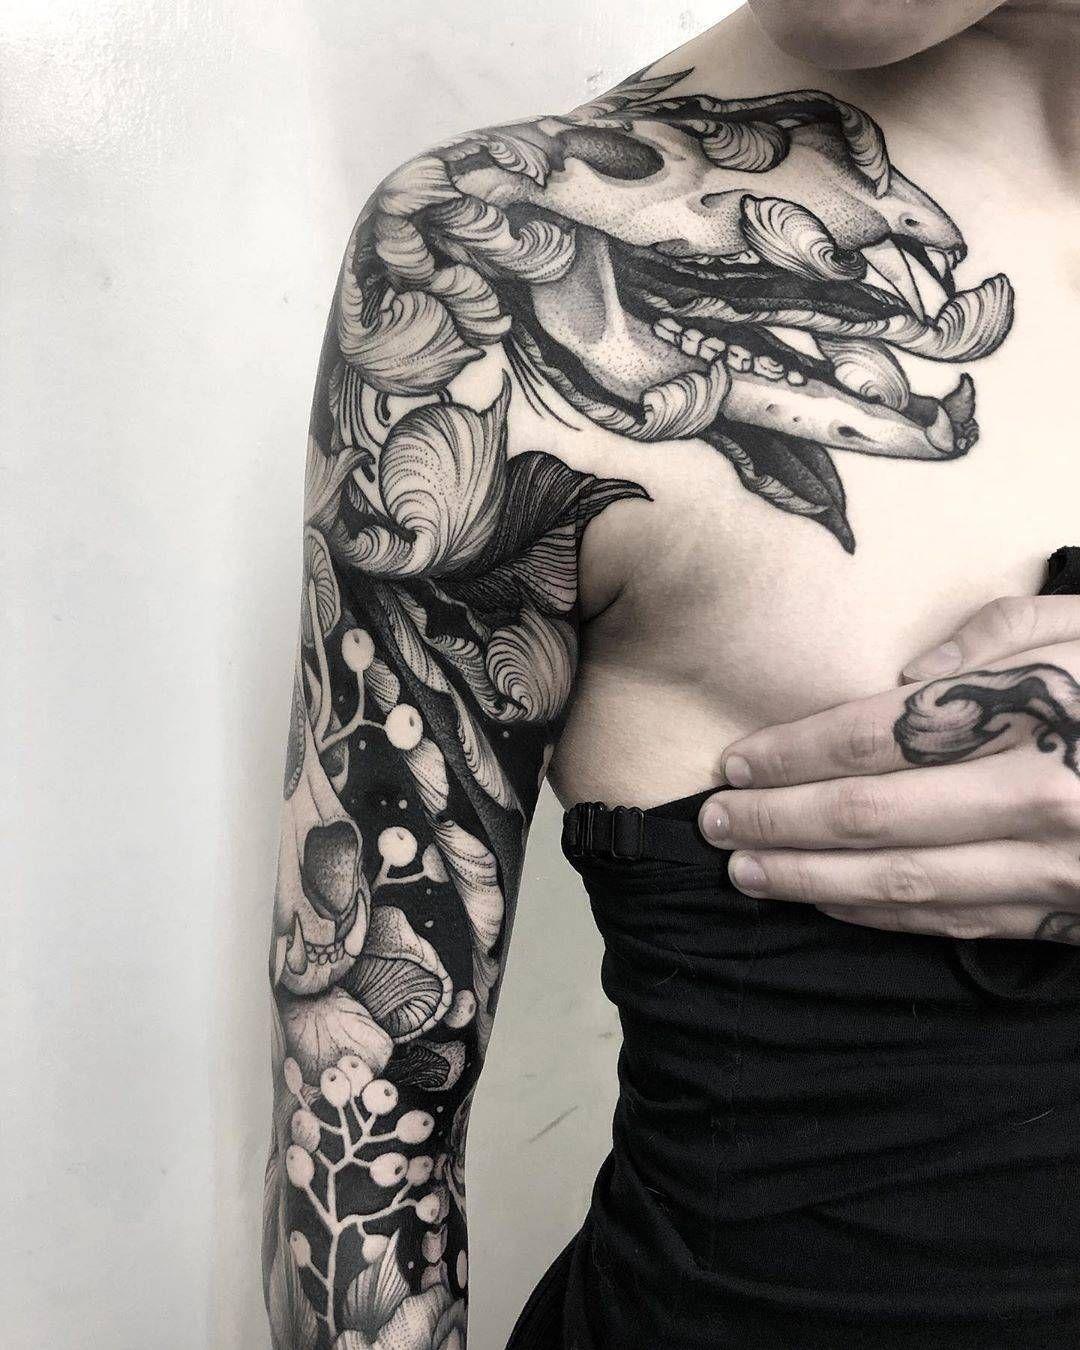 Incredible black tattoos by Kelly Violet